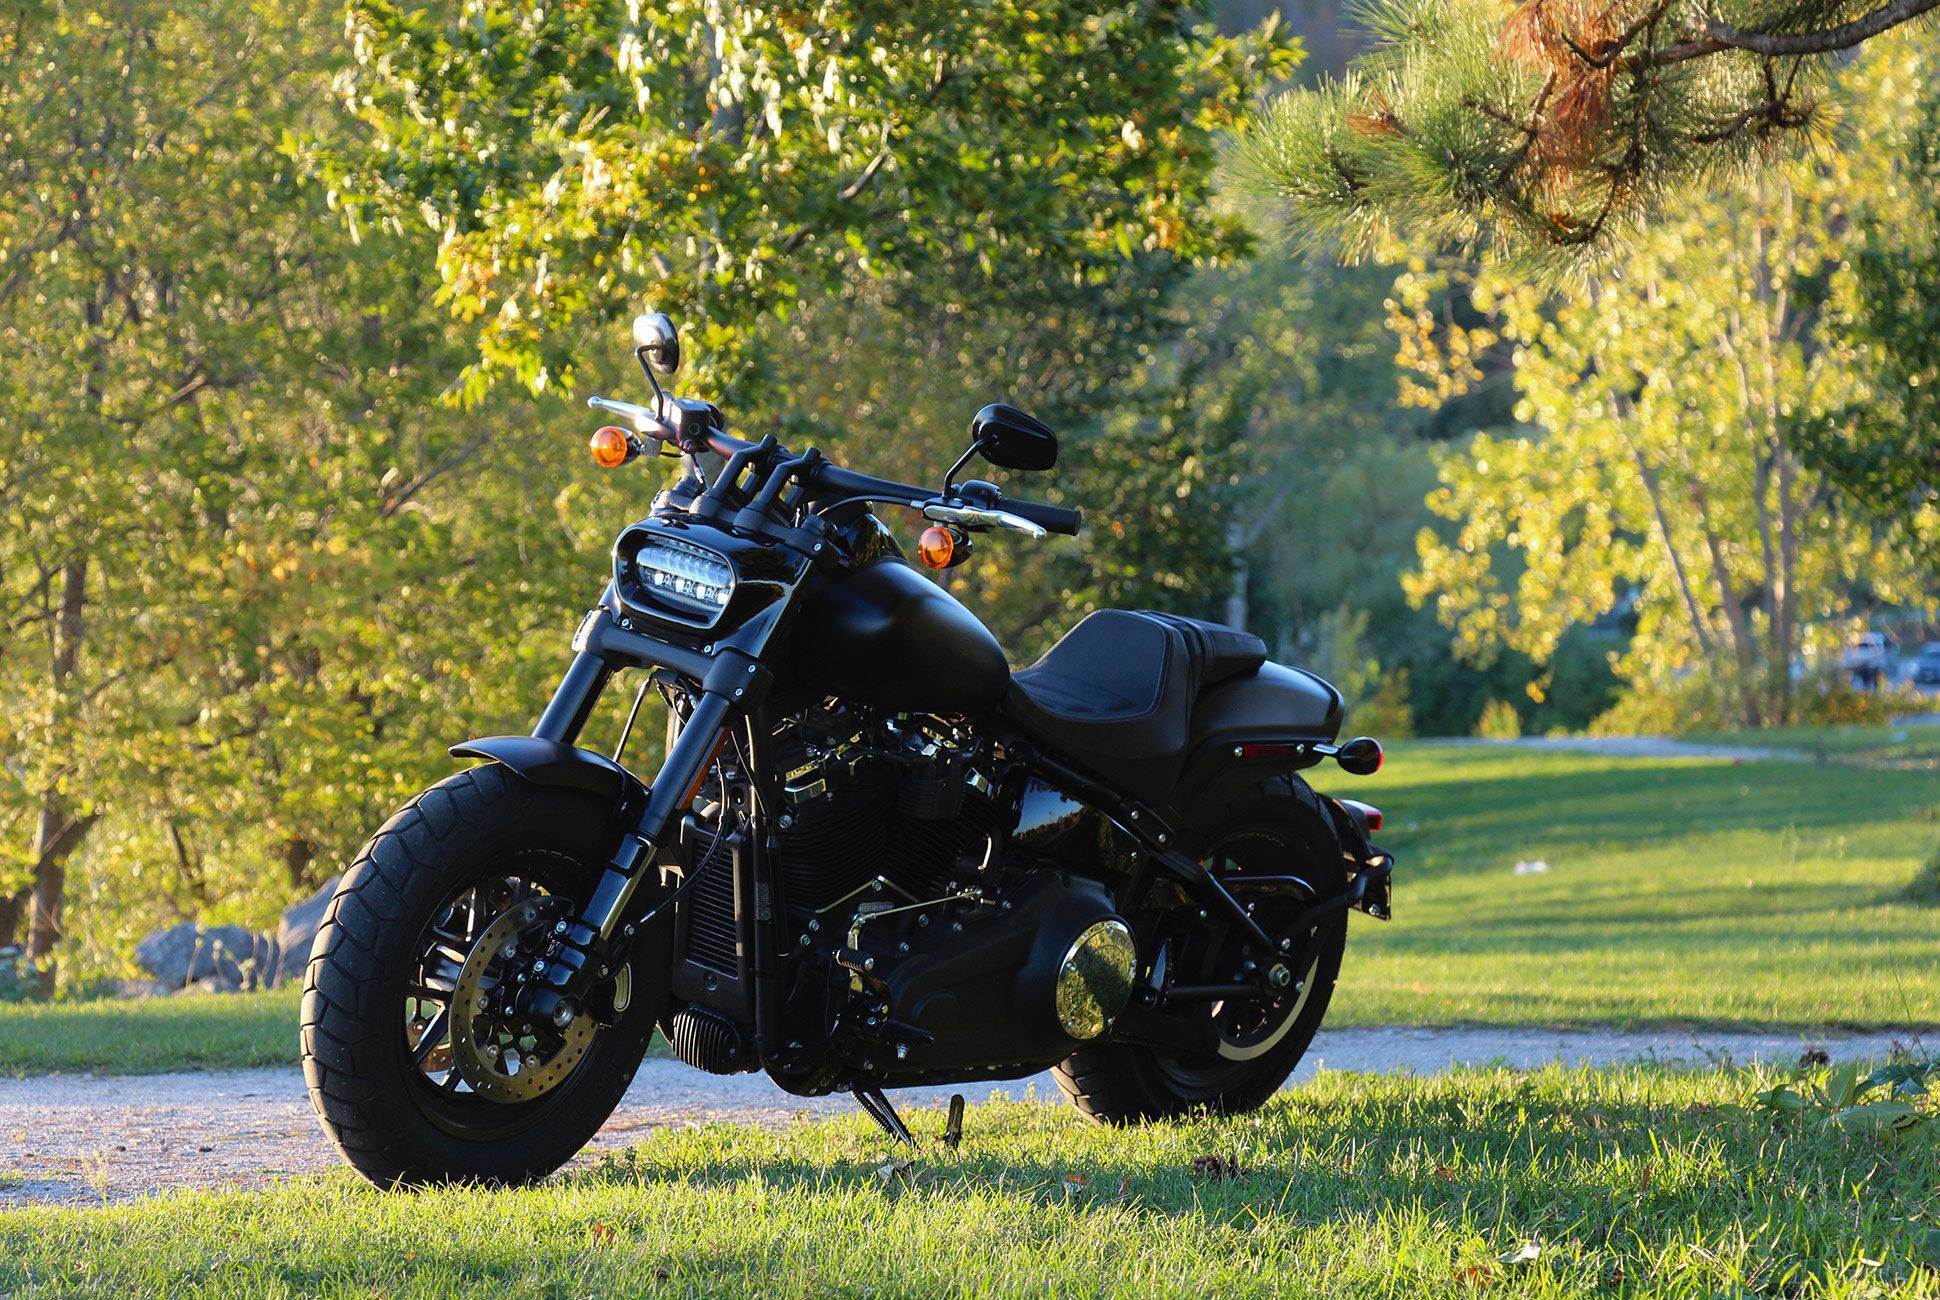 Review: 2018 Harley-Davidson Fat Bob • Gear Patrol